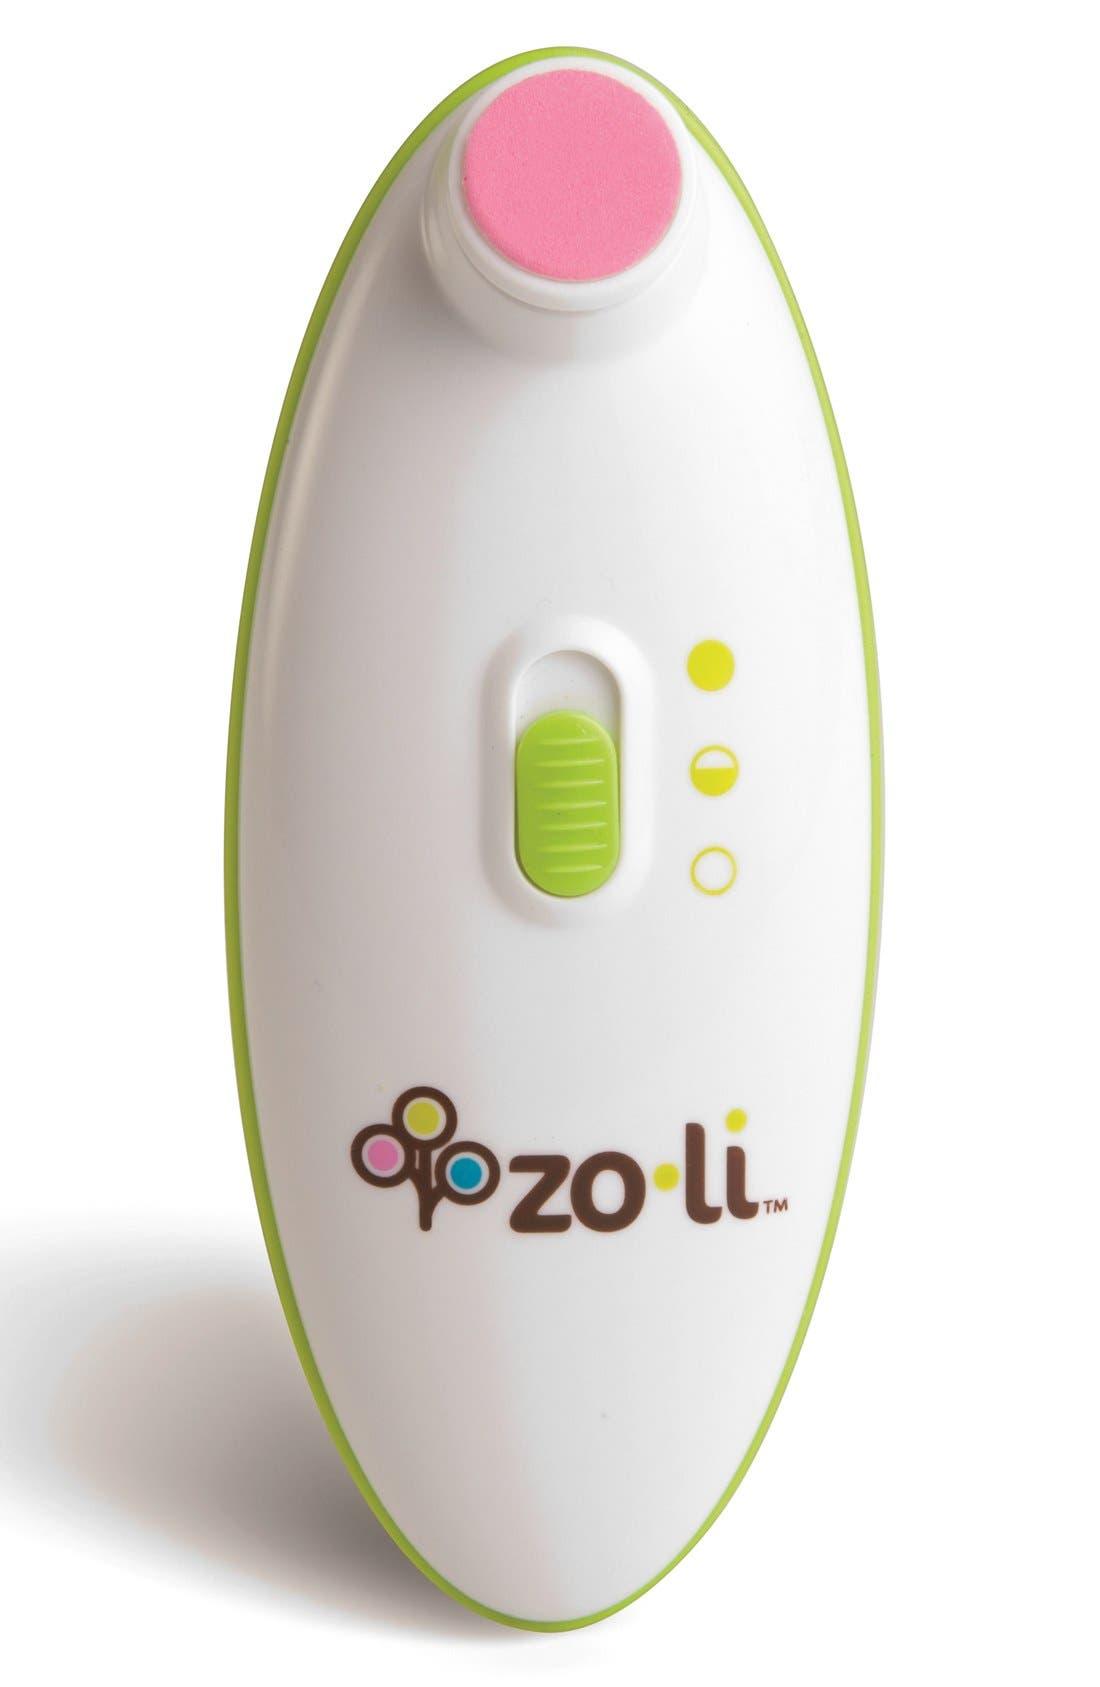 ZoLi 'BUZZ B.™' Electric Nail Trimmer